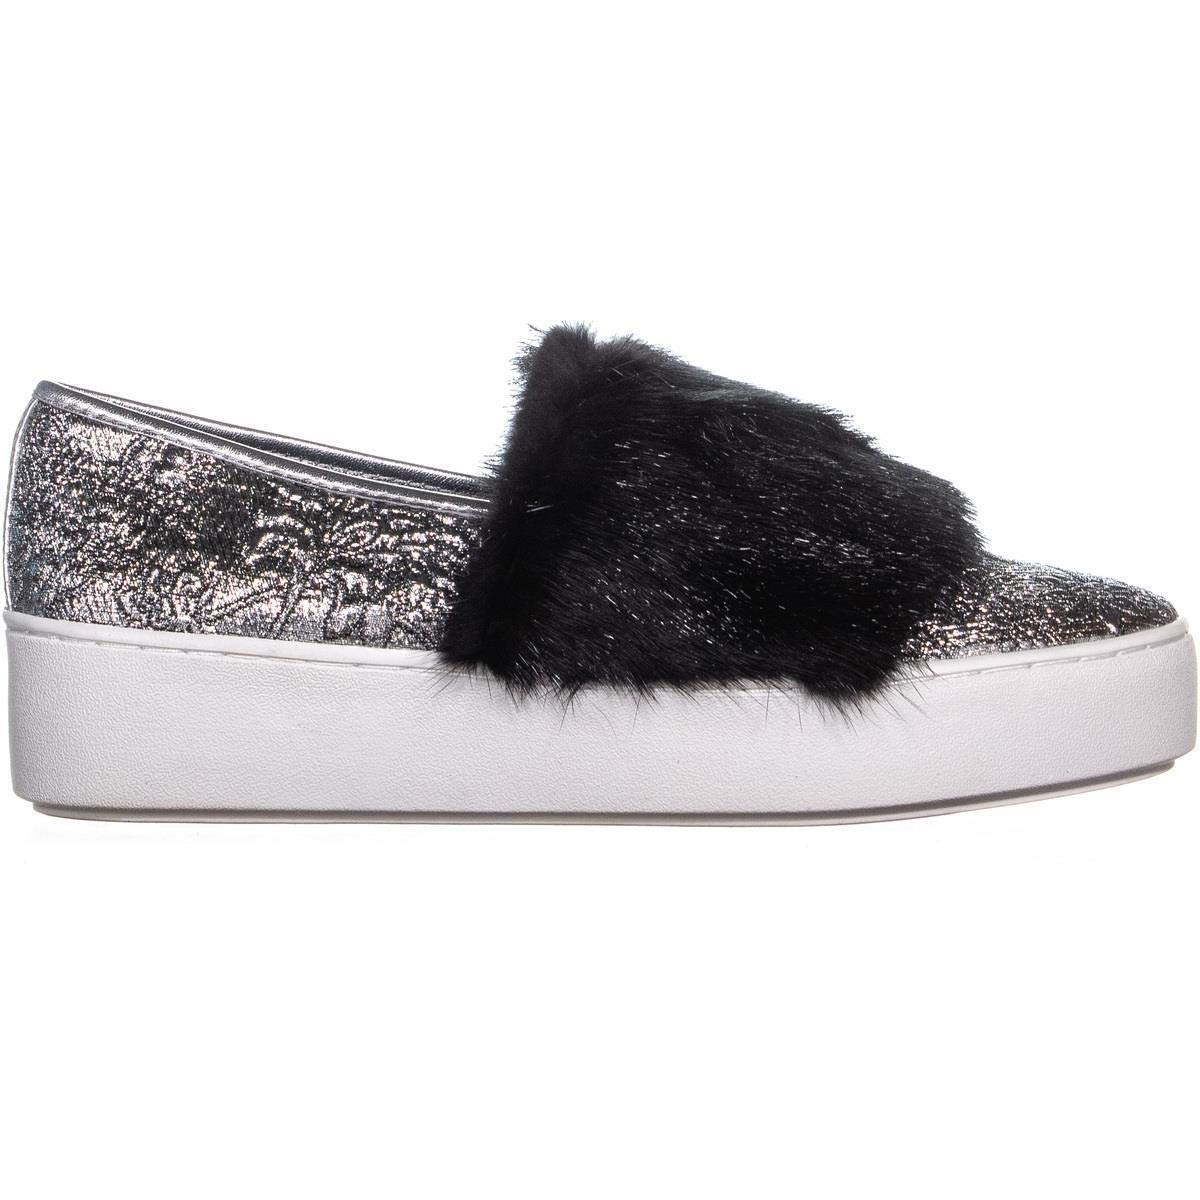 b185b207758ee Michael Kors Women's Lorelai Metallic Mink Fur Skate Fashion Sneakers